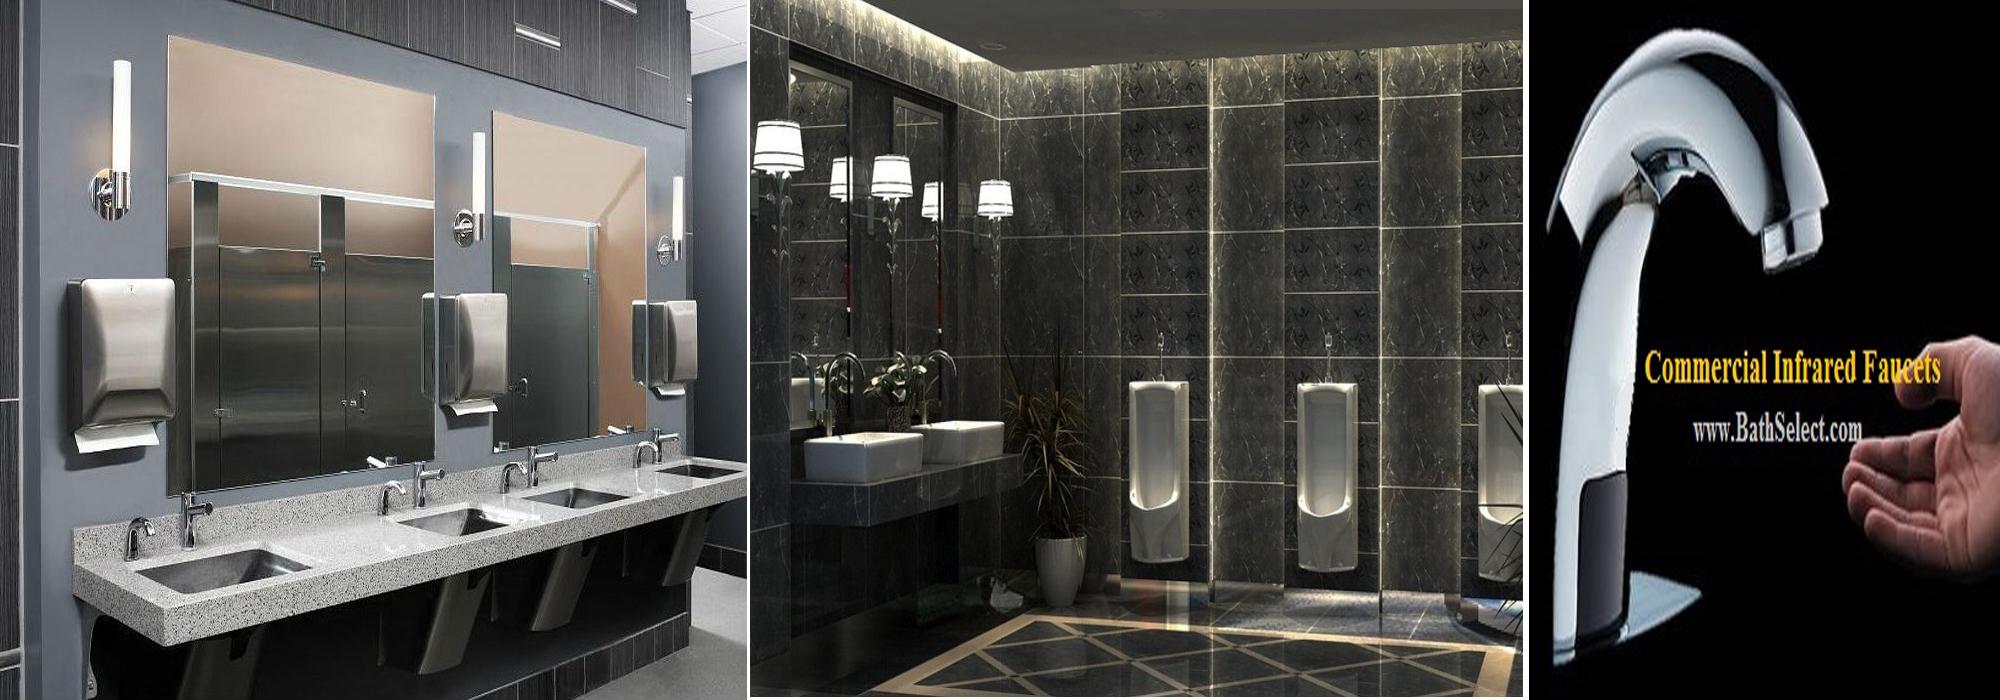 Lavatory Commercial Sensor Faucets - Bathselect Blog